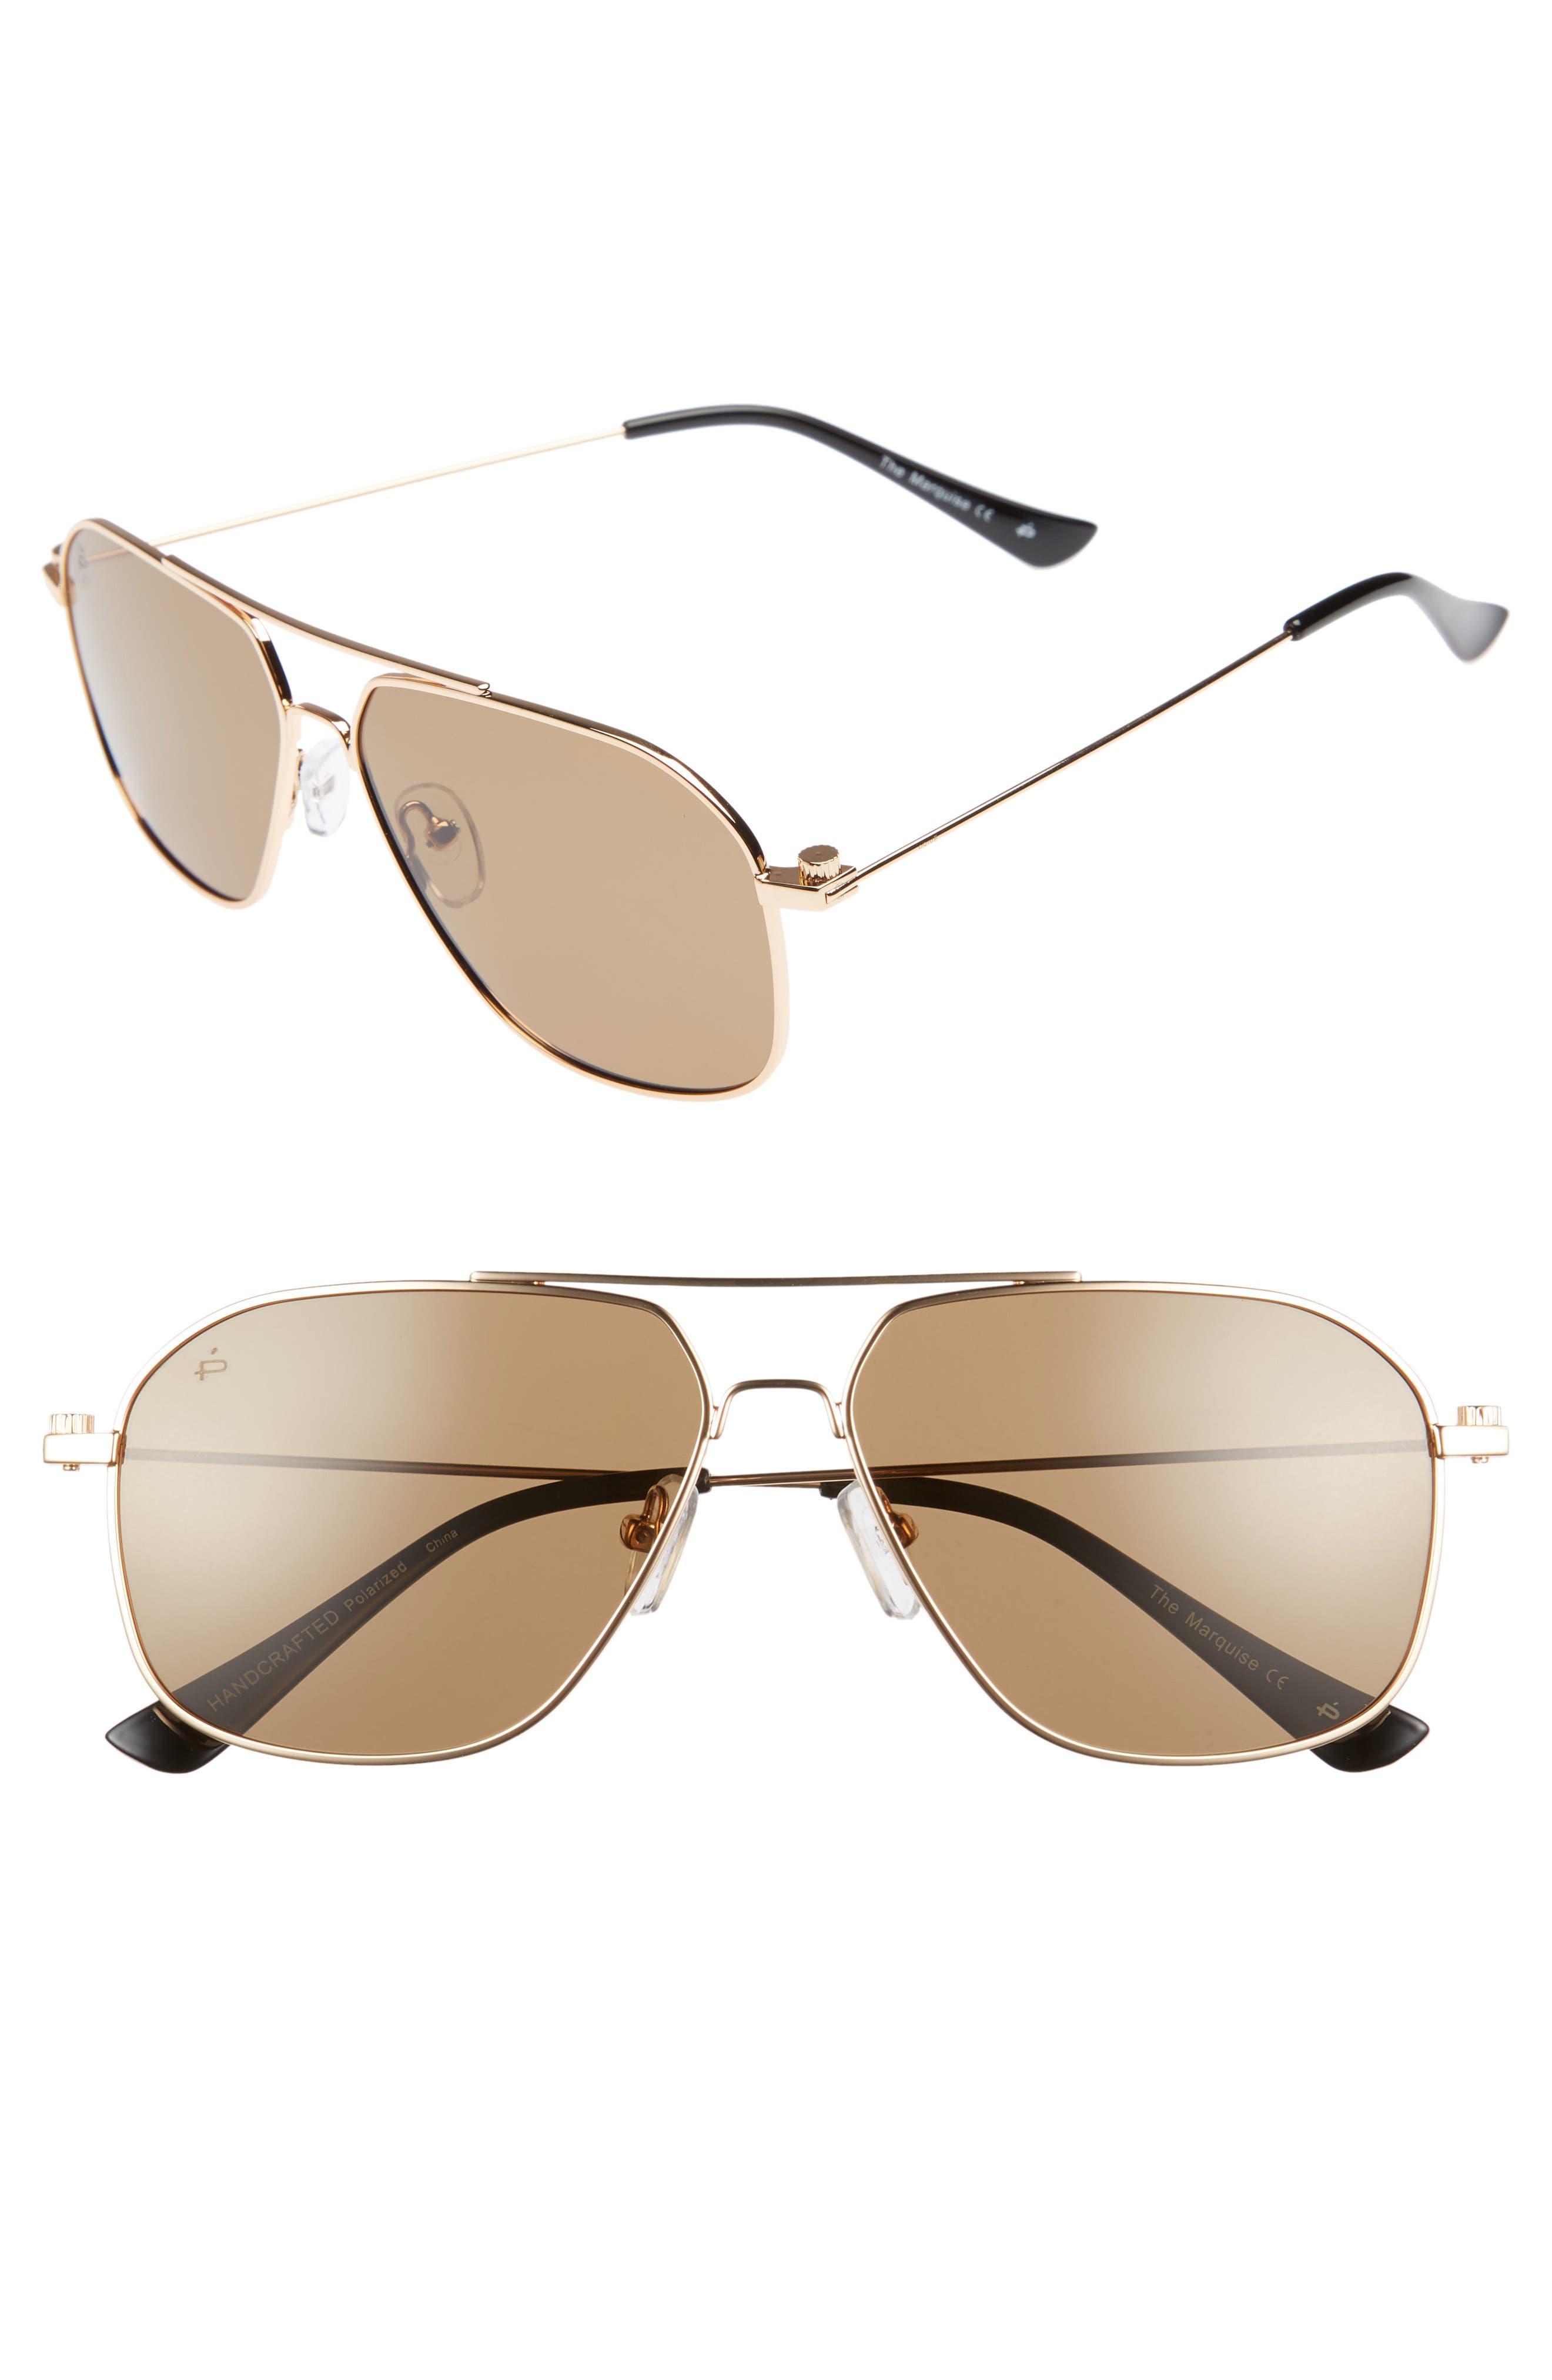 Main Image - Privé Revaux The Marquise 58mm Aviator Sunglasses